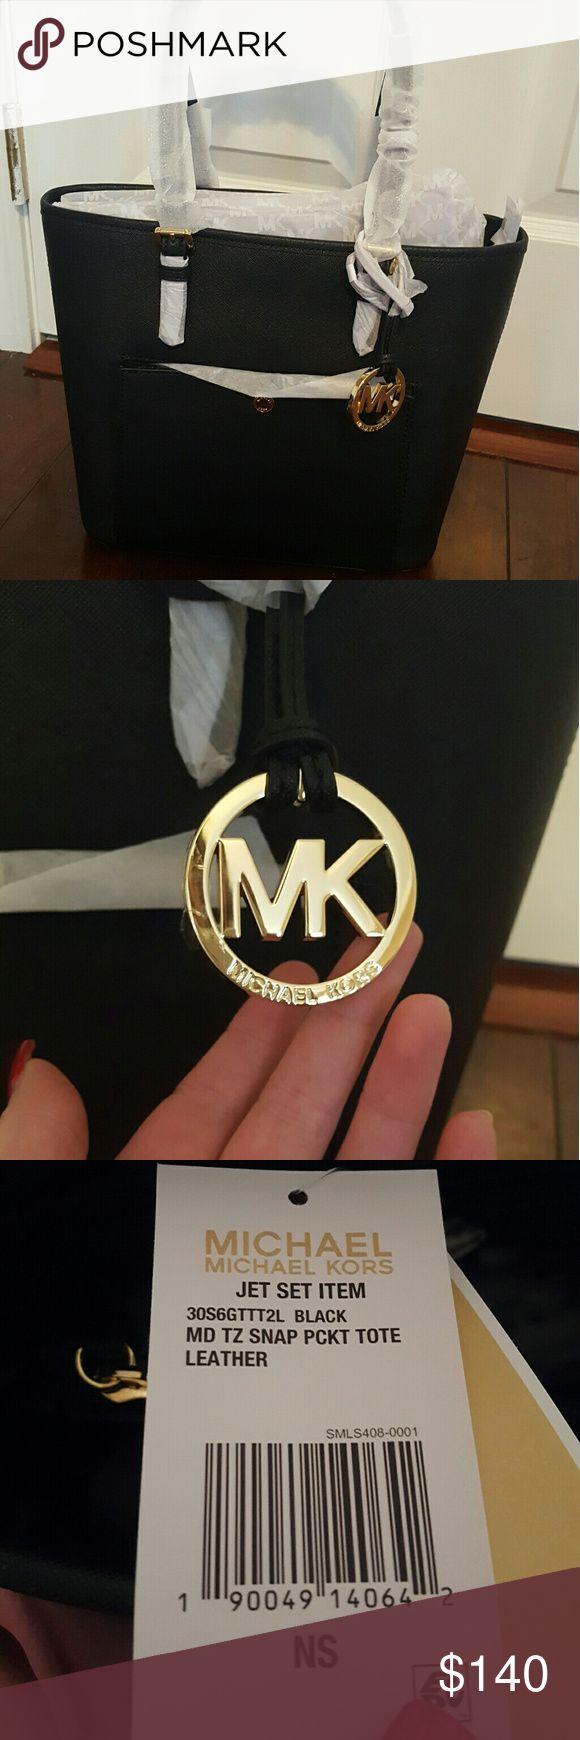 Michael Kors Purse/tote Jet set black purse/tote. Genuine MK. Brand new. Never used. Michael Kors Bags